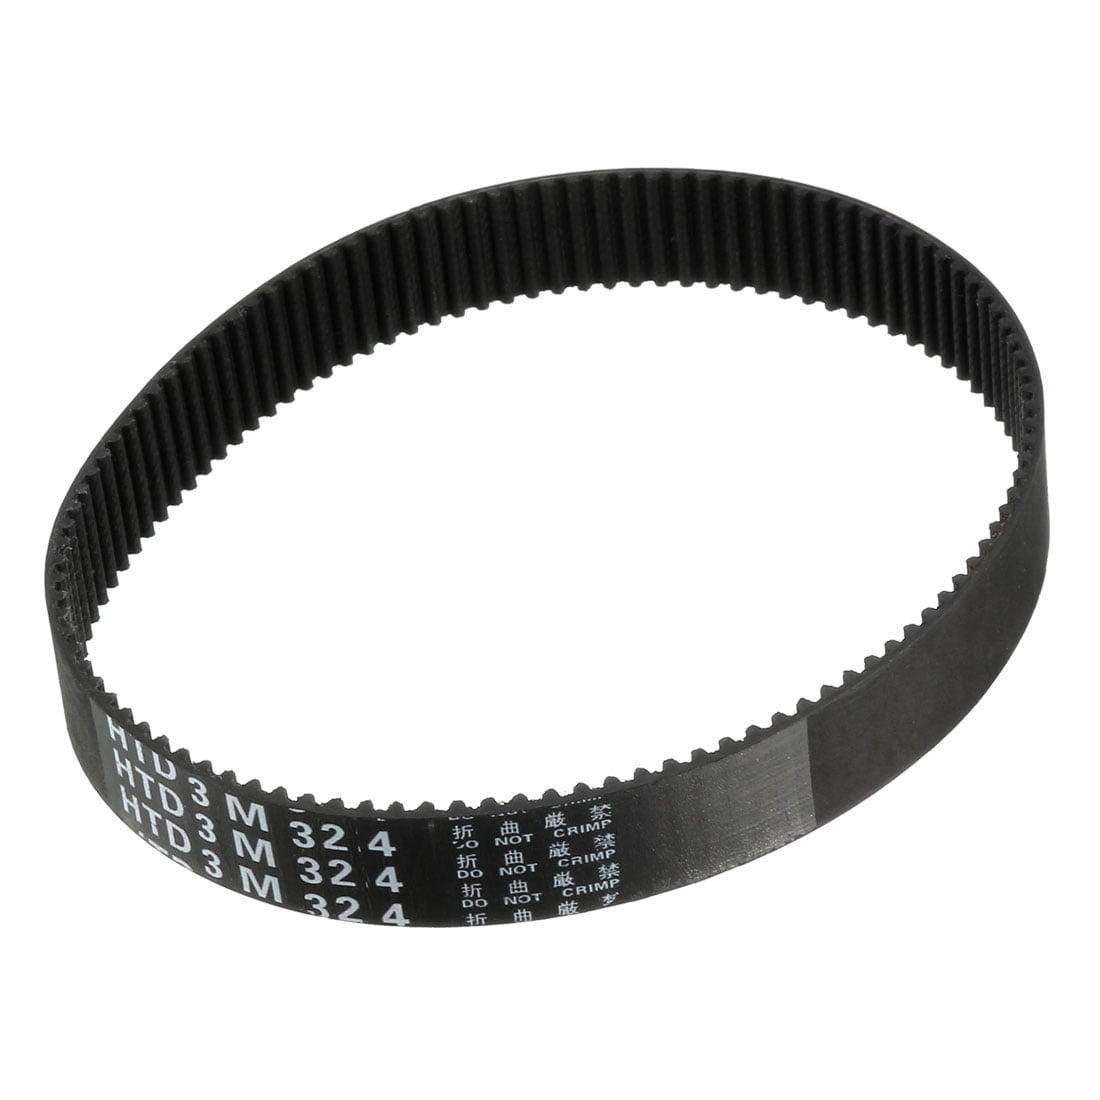 Unique Bargains HTD3M 108 Teeth Engine Timing Belt Rubber Geared-Belt 324mm Girth 15mm Width - image 2 de 2